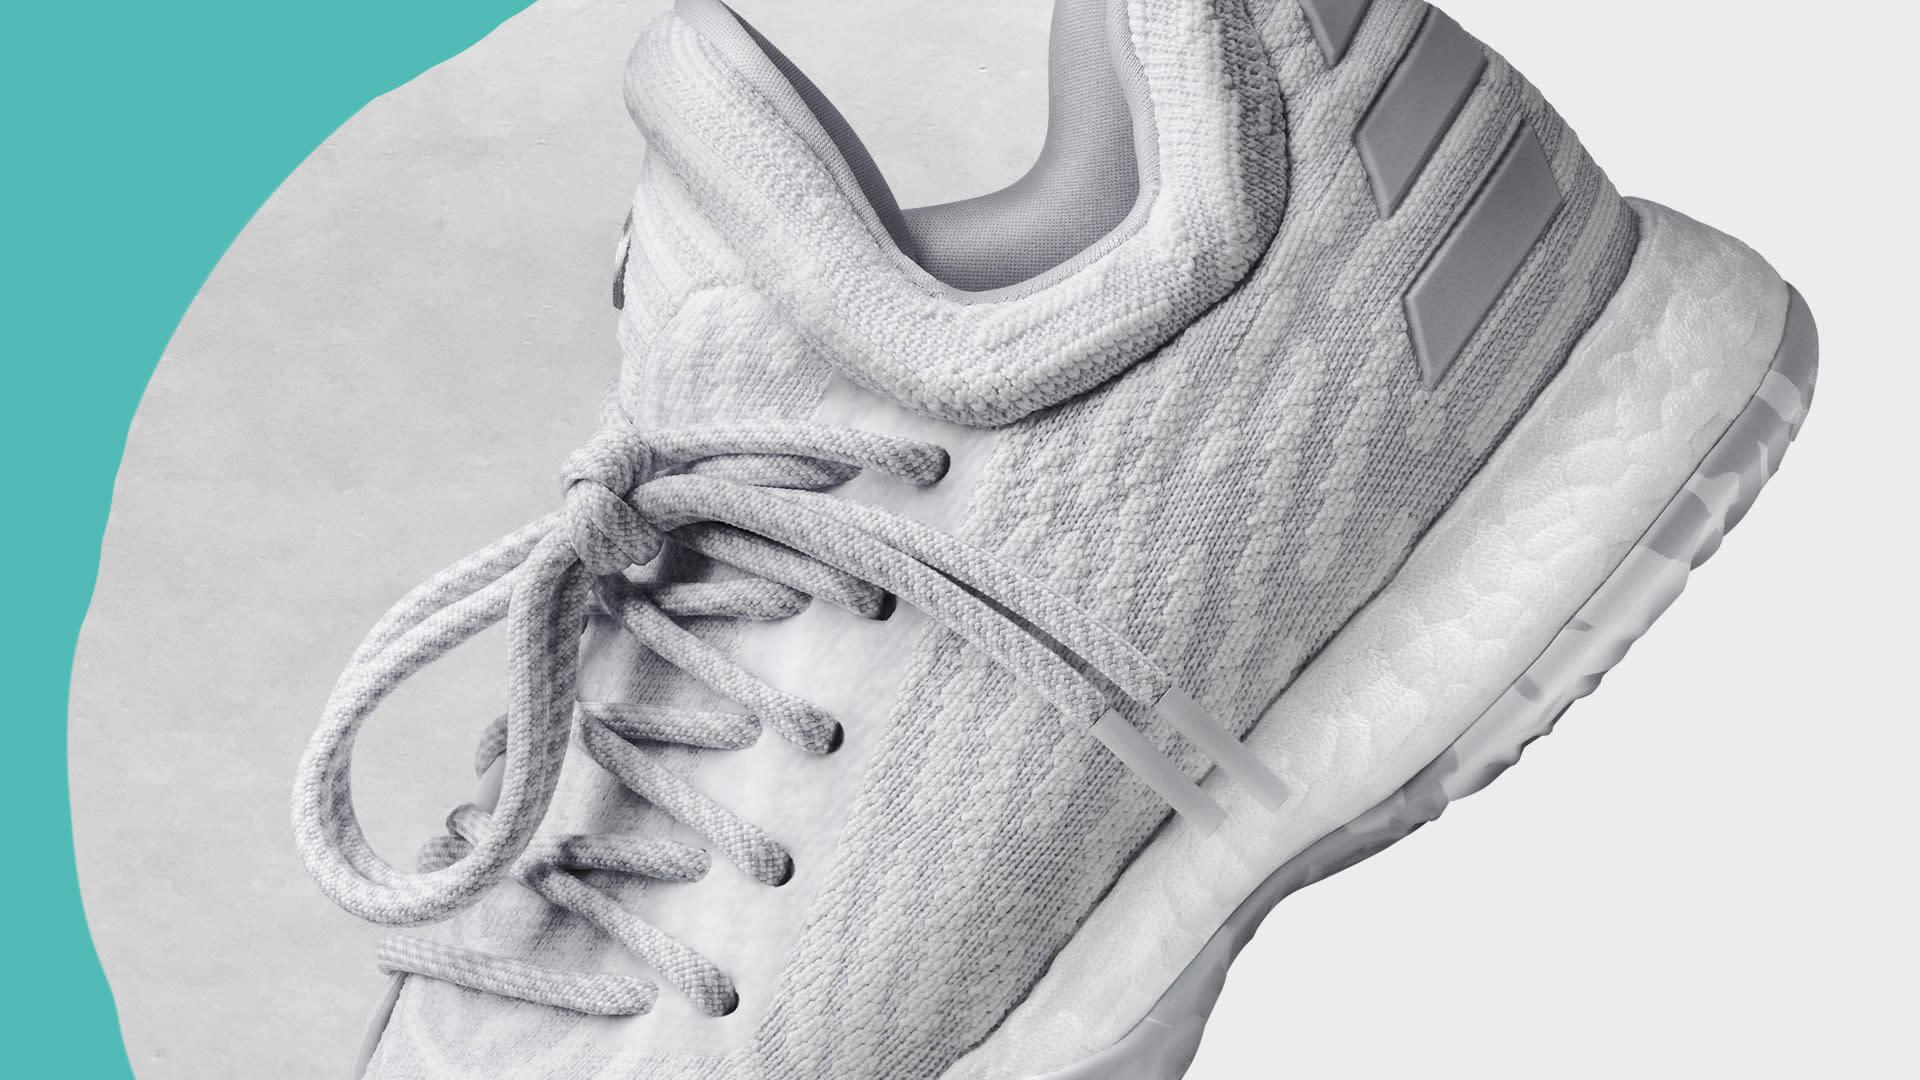 Adidas Harden LS LA Life